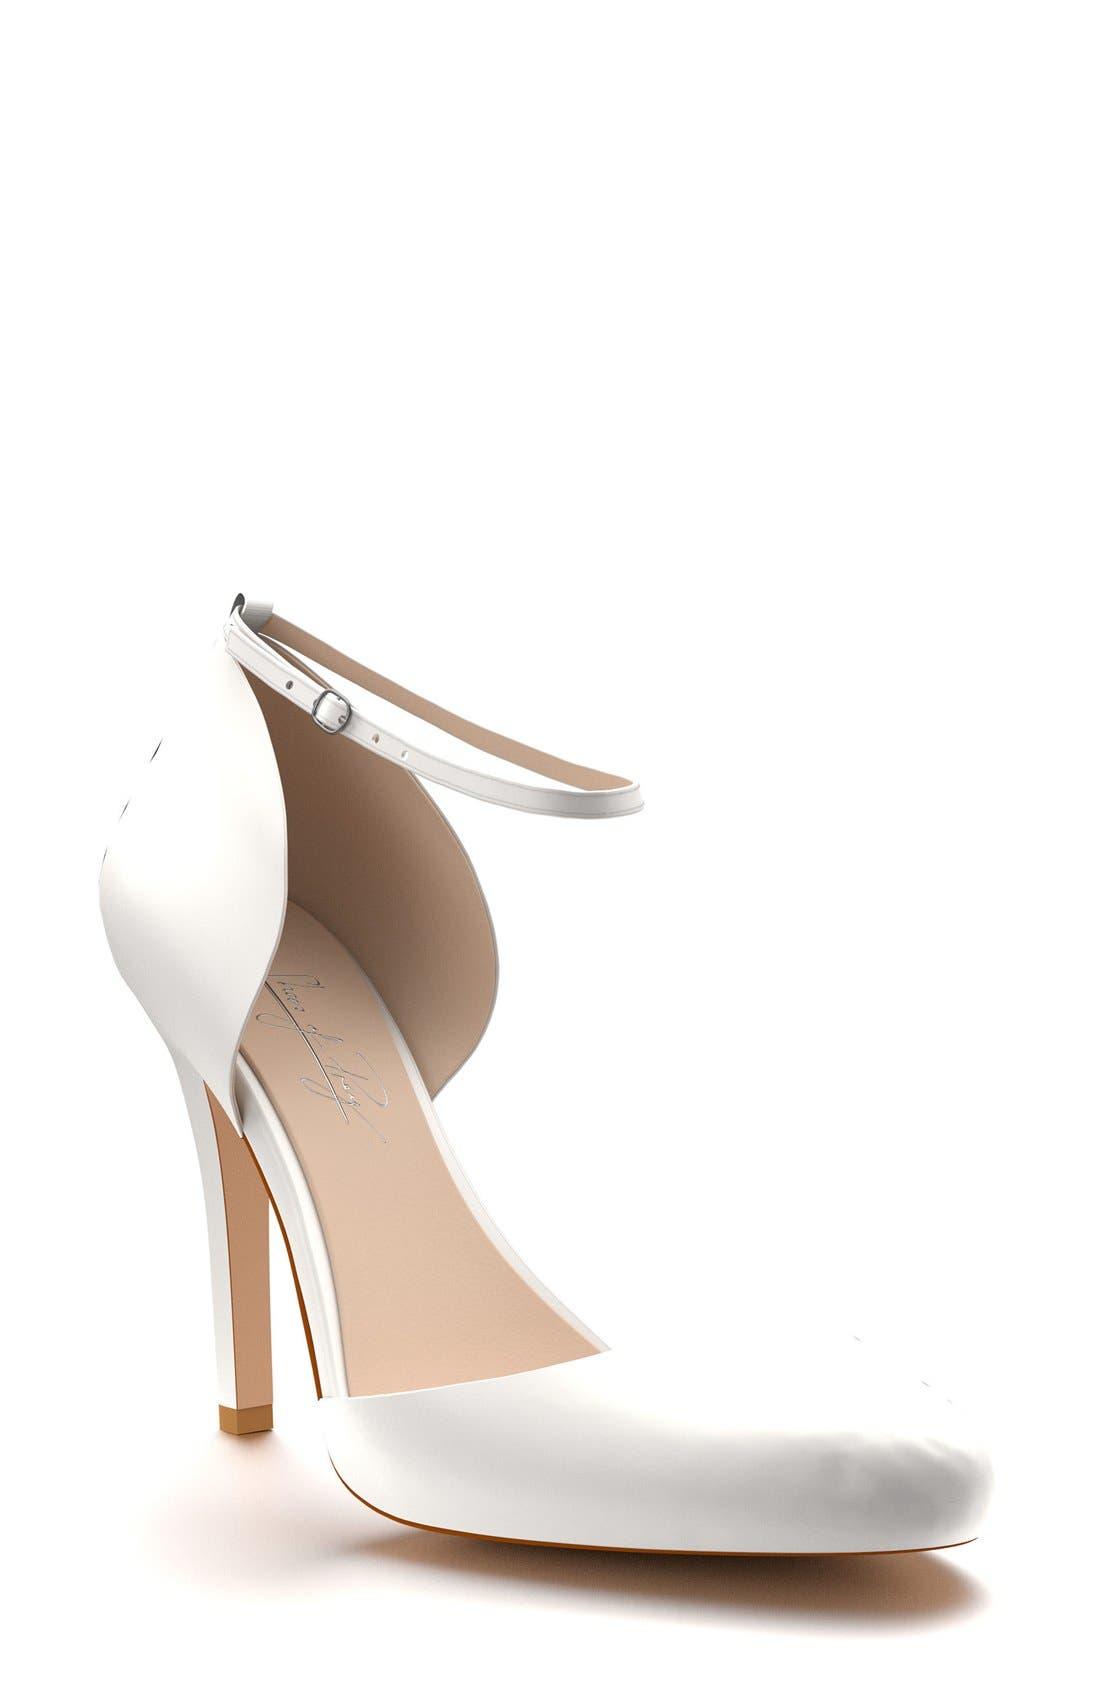 Shoes of Prey Ankle Strap d'Orsay Pump (Women)